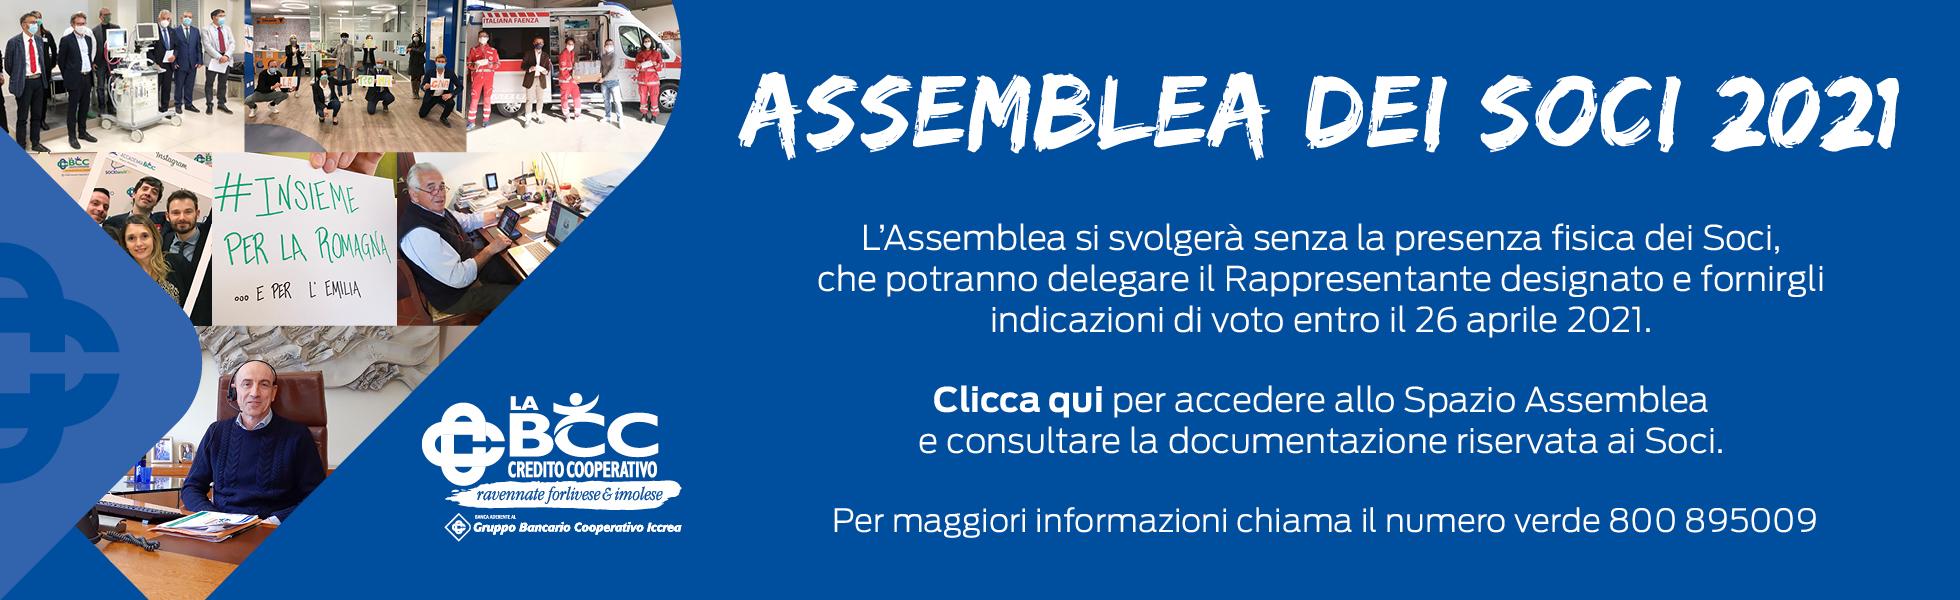 assemblea 2021 LA BCC